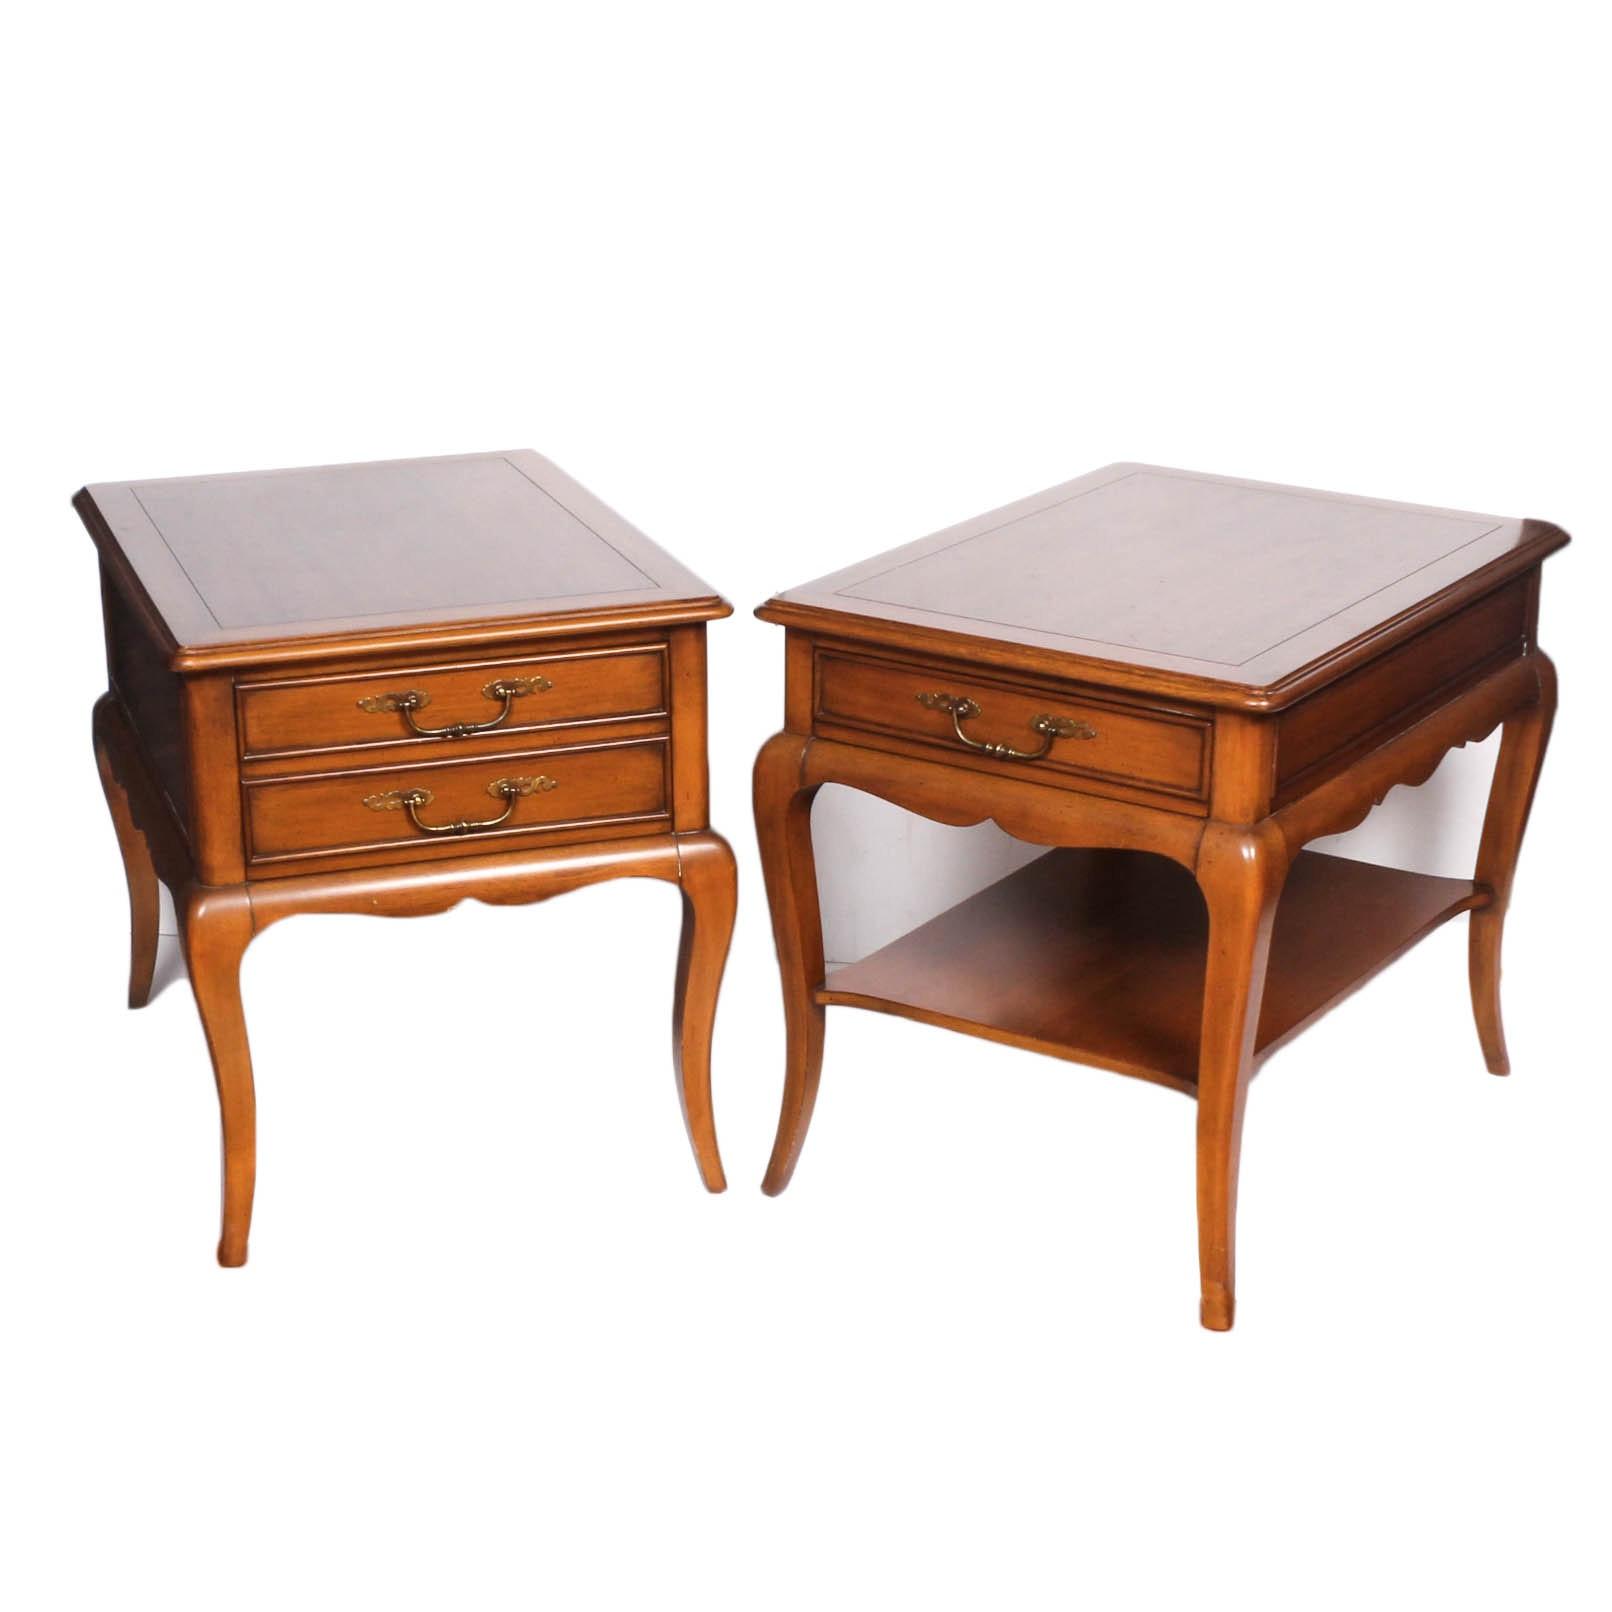 Vintage Hekman Wooden Side Tables